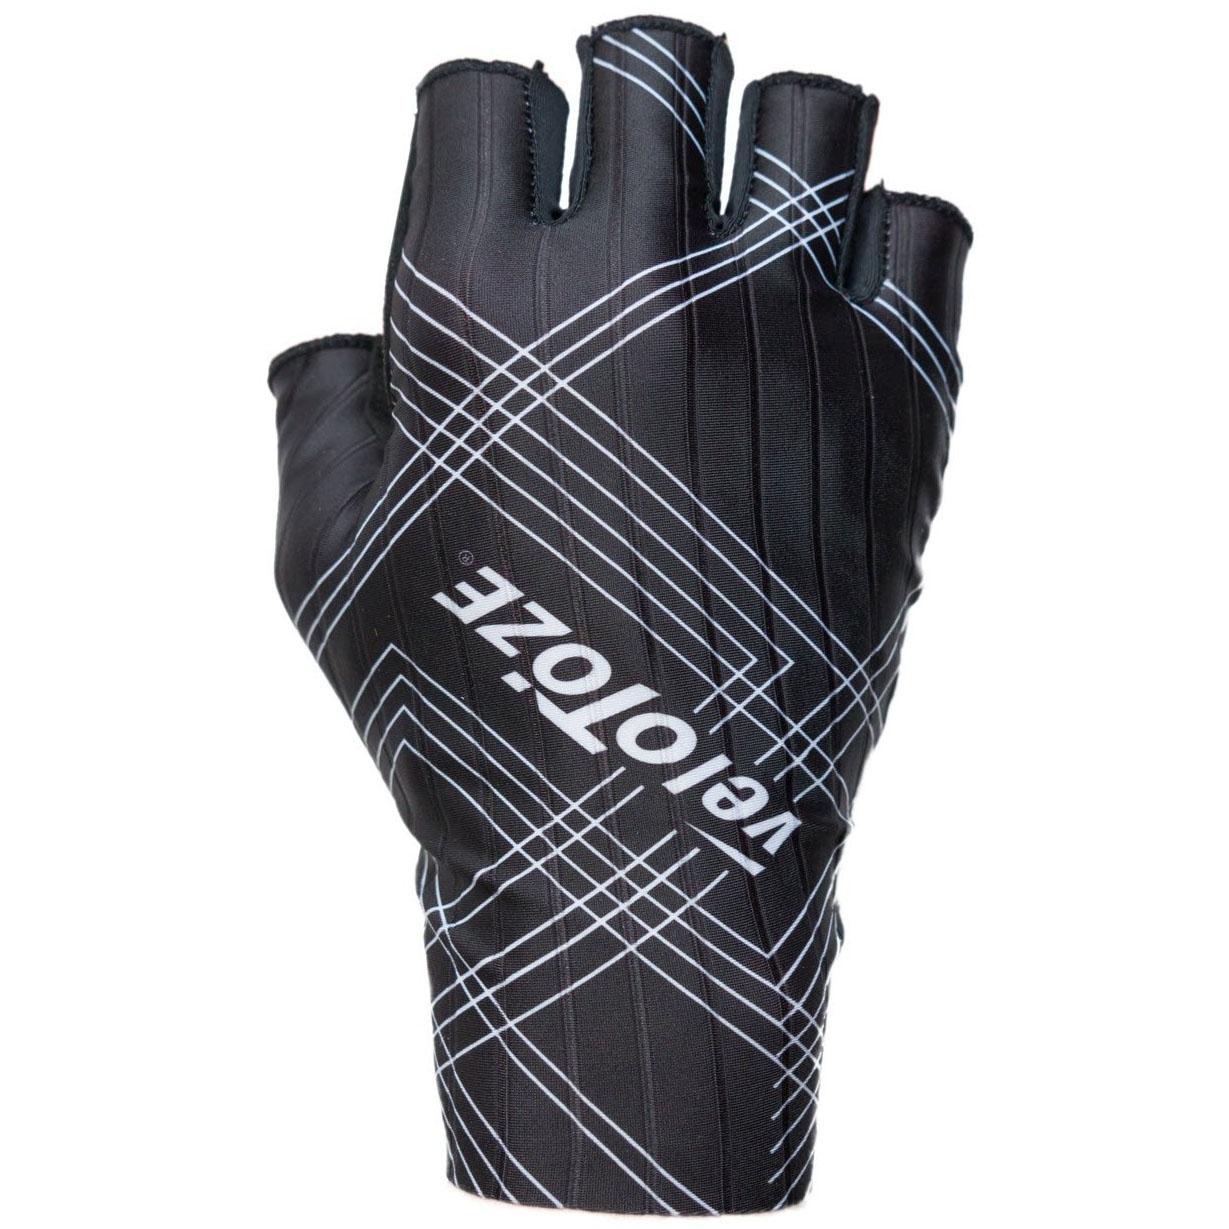 veloToze Aero Handschuhe - black